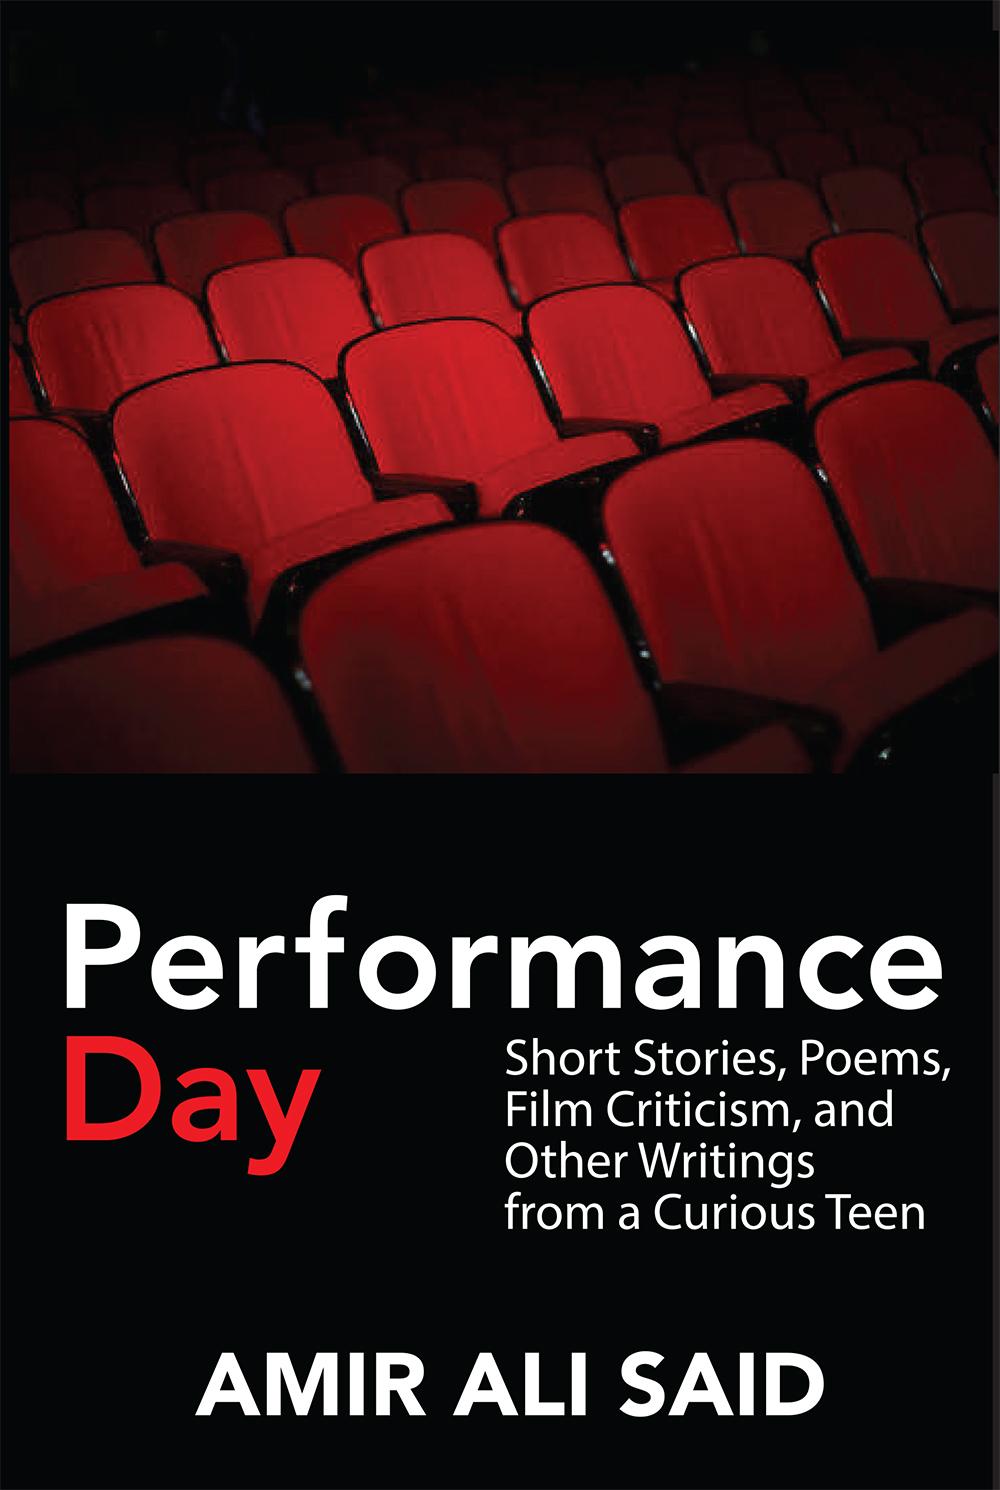 Performance_Day_SB_thumb.jpg